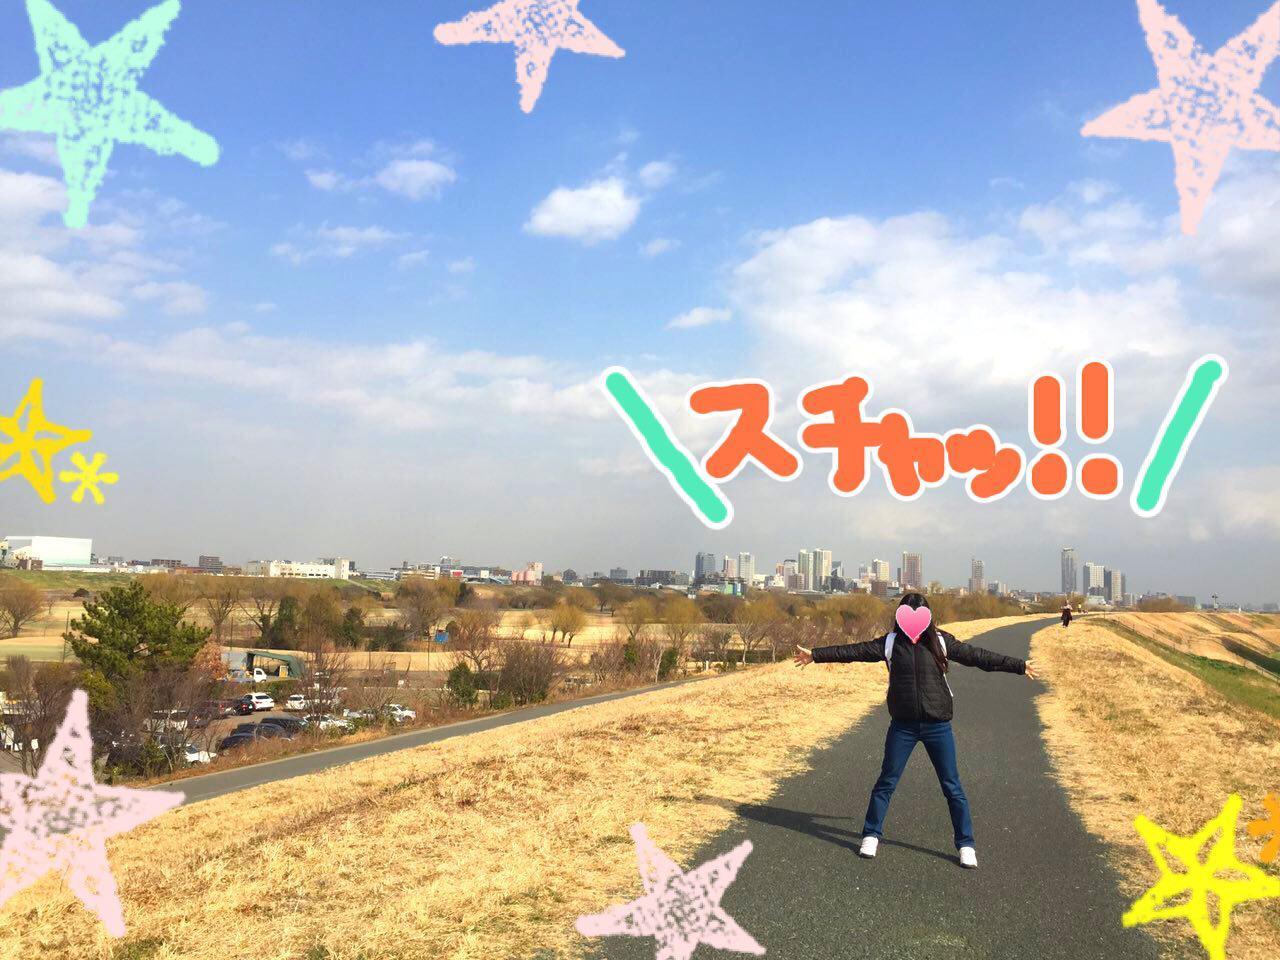 photo_2017-02-21_00-35-29.jpg